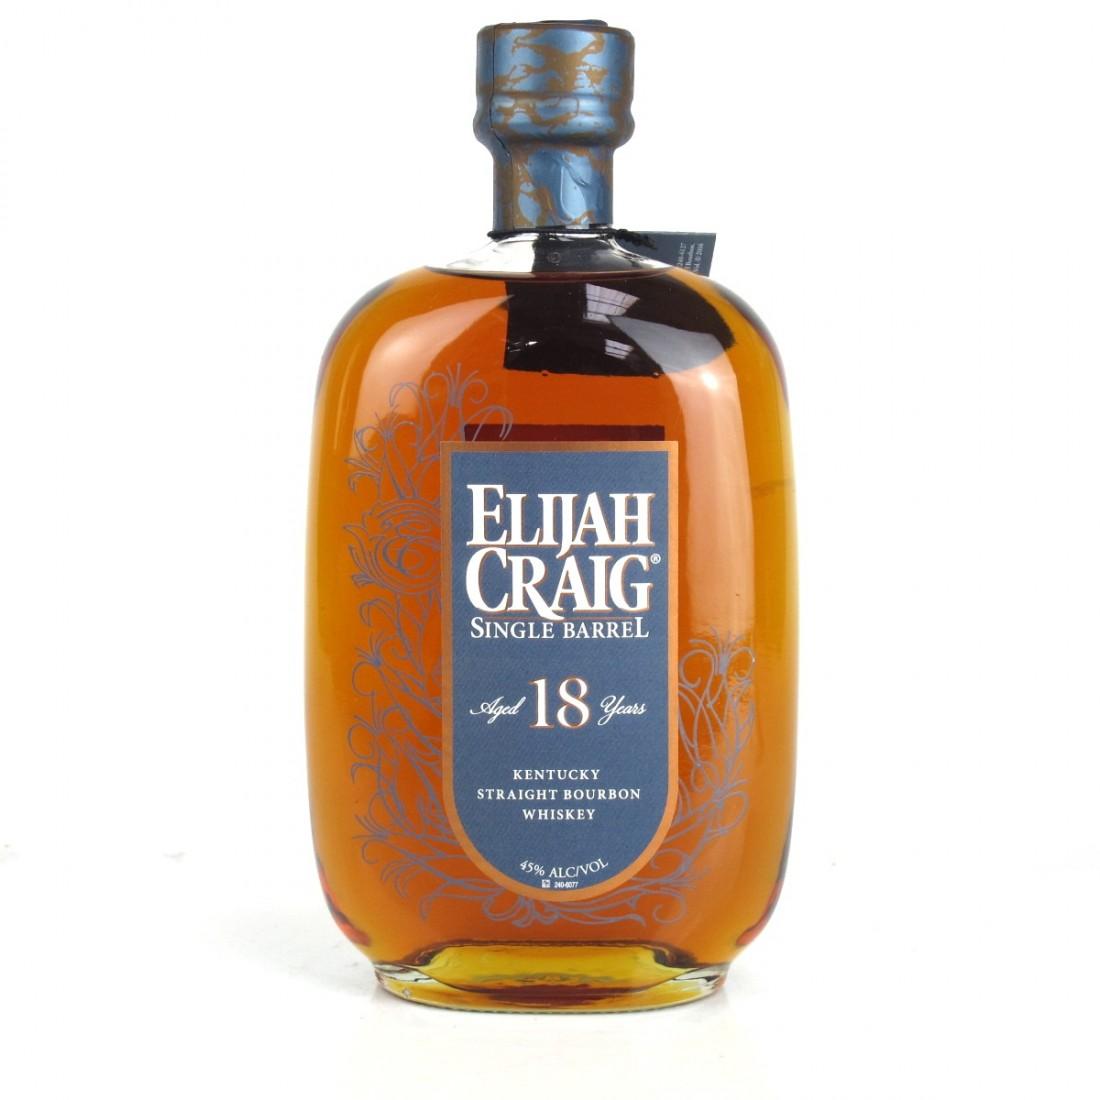 Elijah Craig 18 Year Old Single Barrel